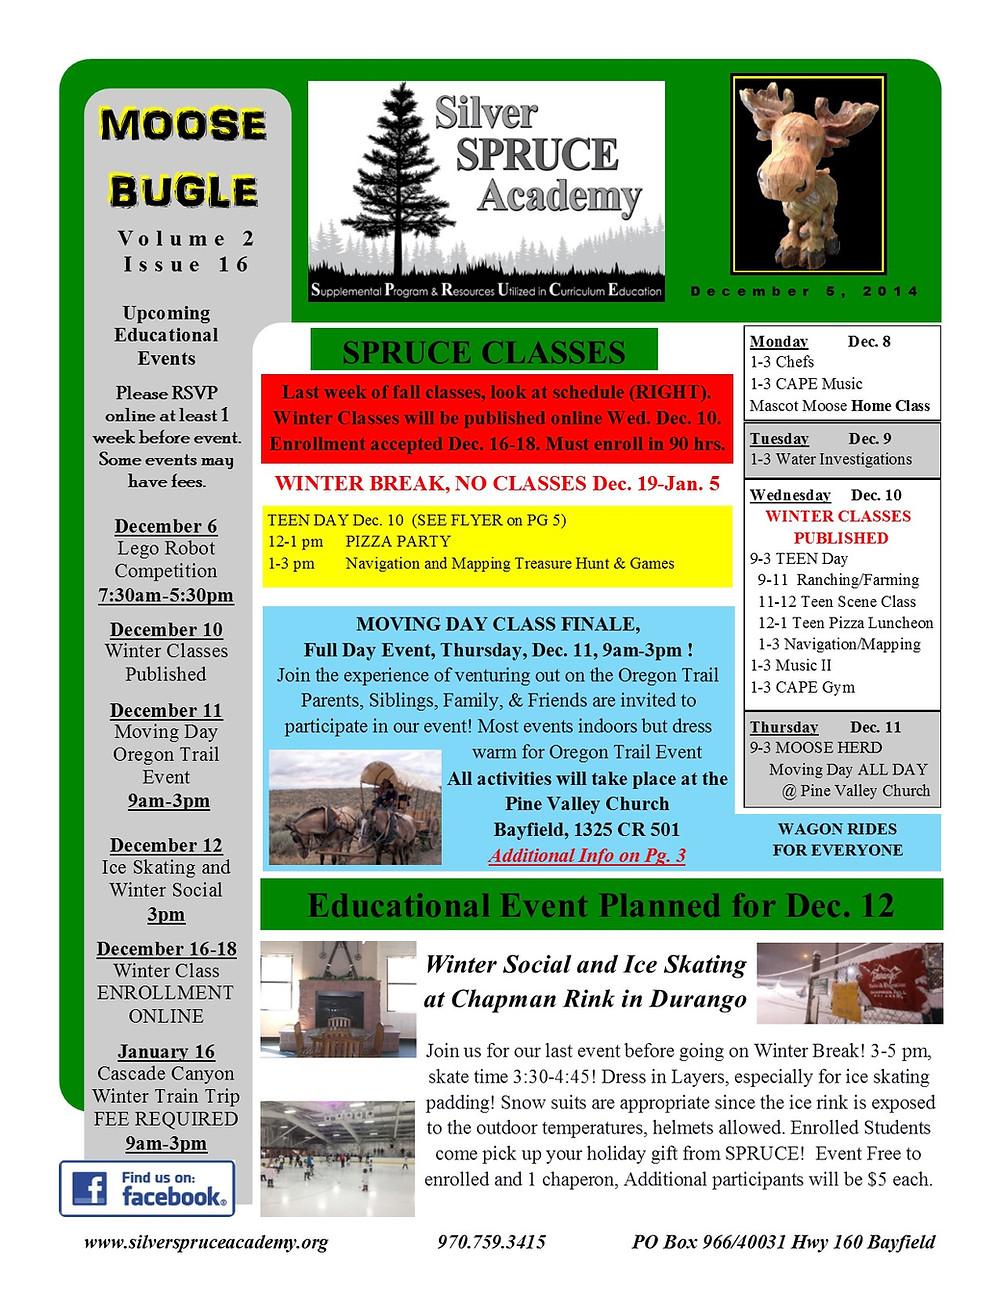 Moose Bugle 12-5-14 Page 1.jpg